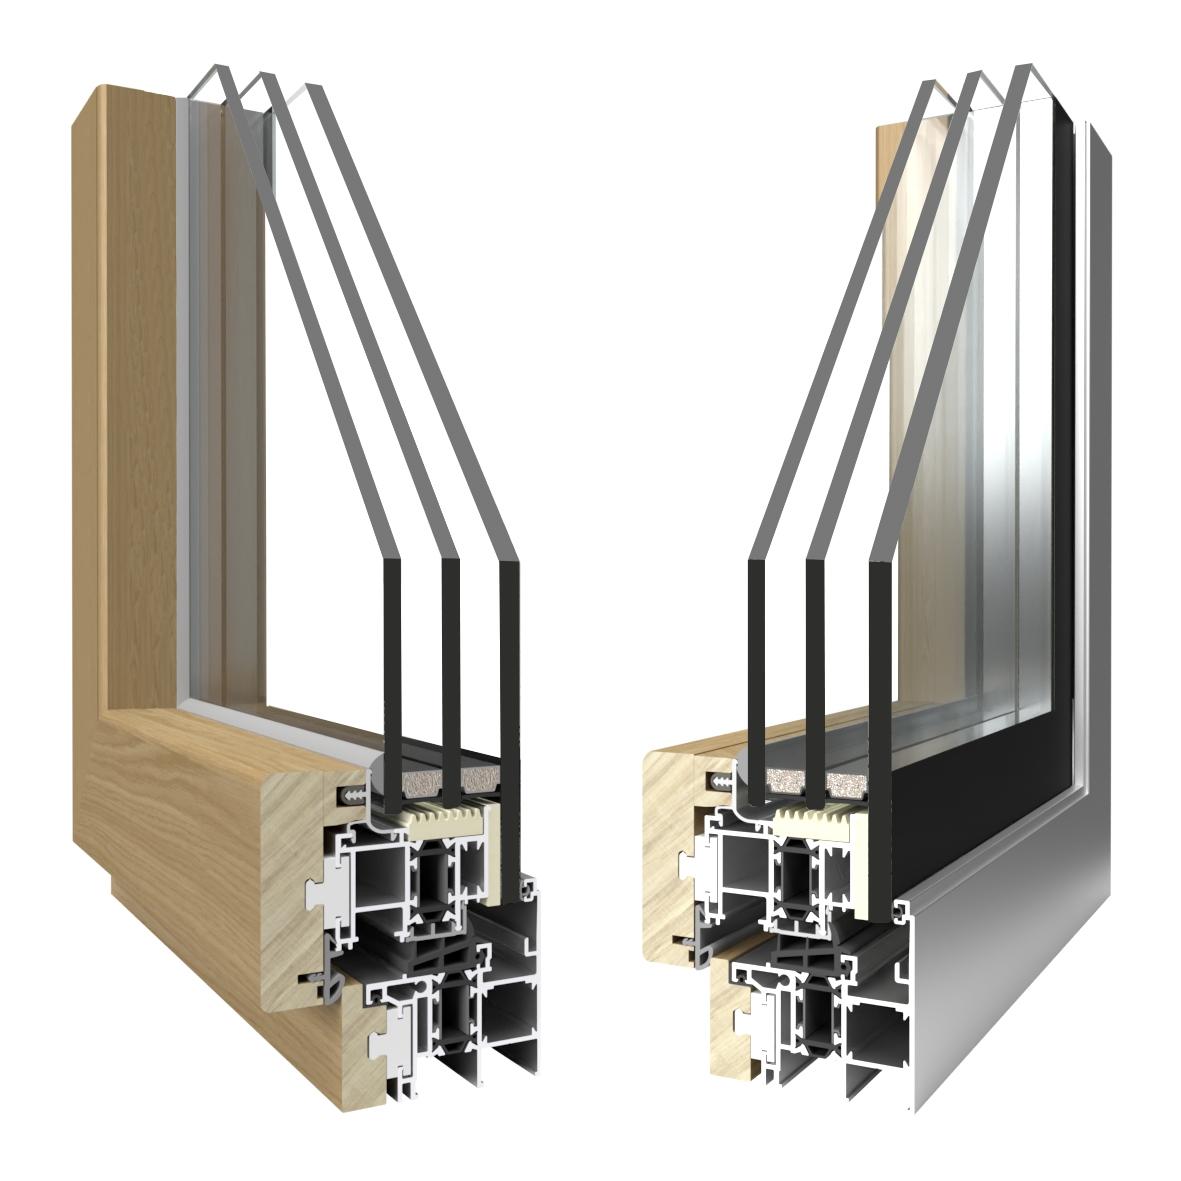 https://www.allpaint.it/wp-content/uploads/2021/07/finestre-alluminio-legno-tkwood-glass-allpaint.jpg